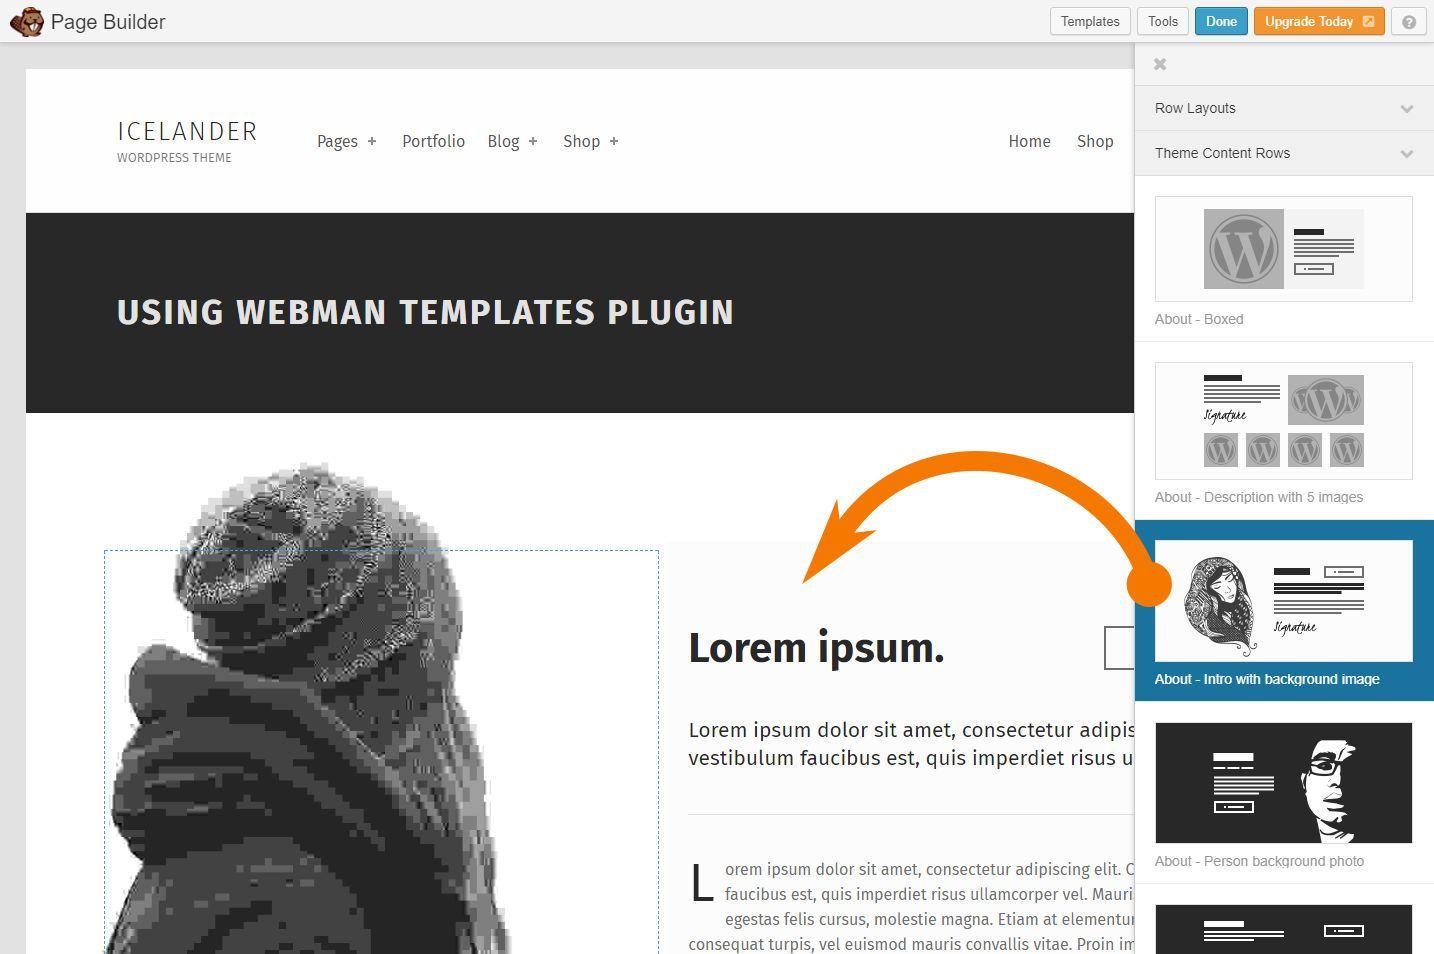 WebMan Templates